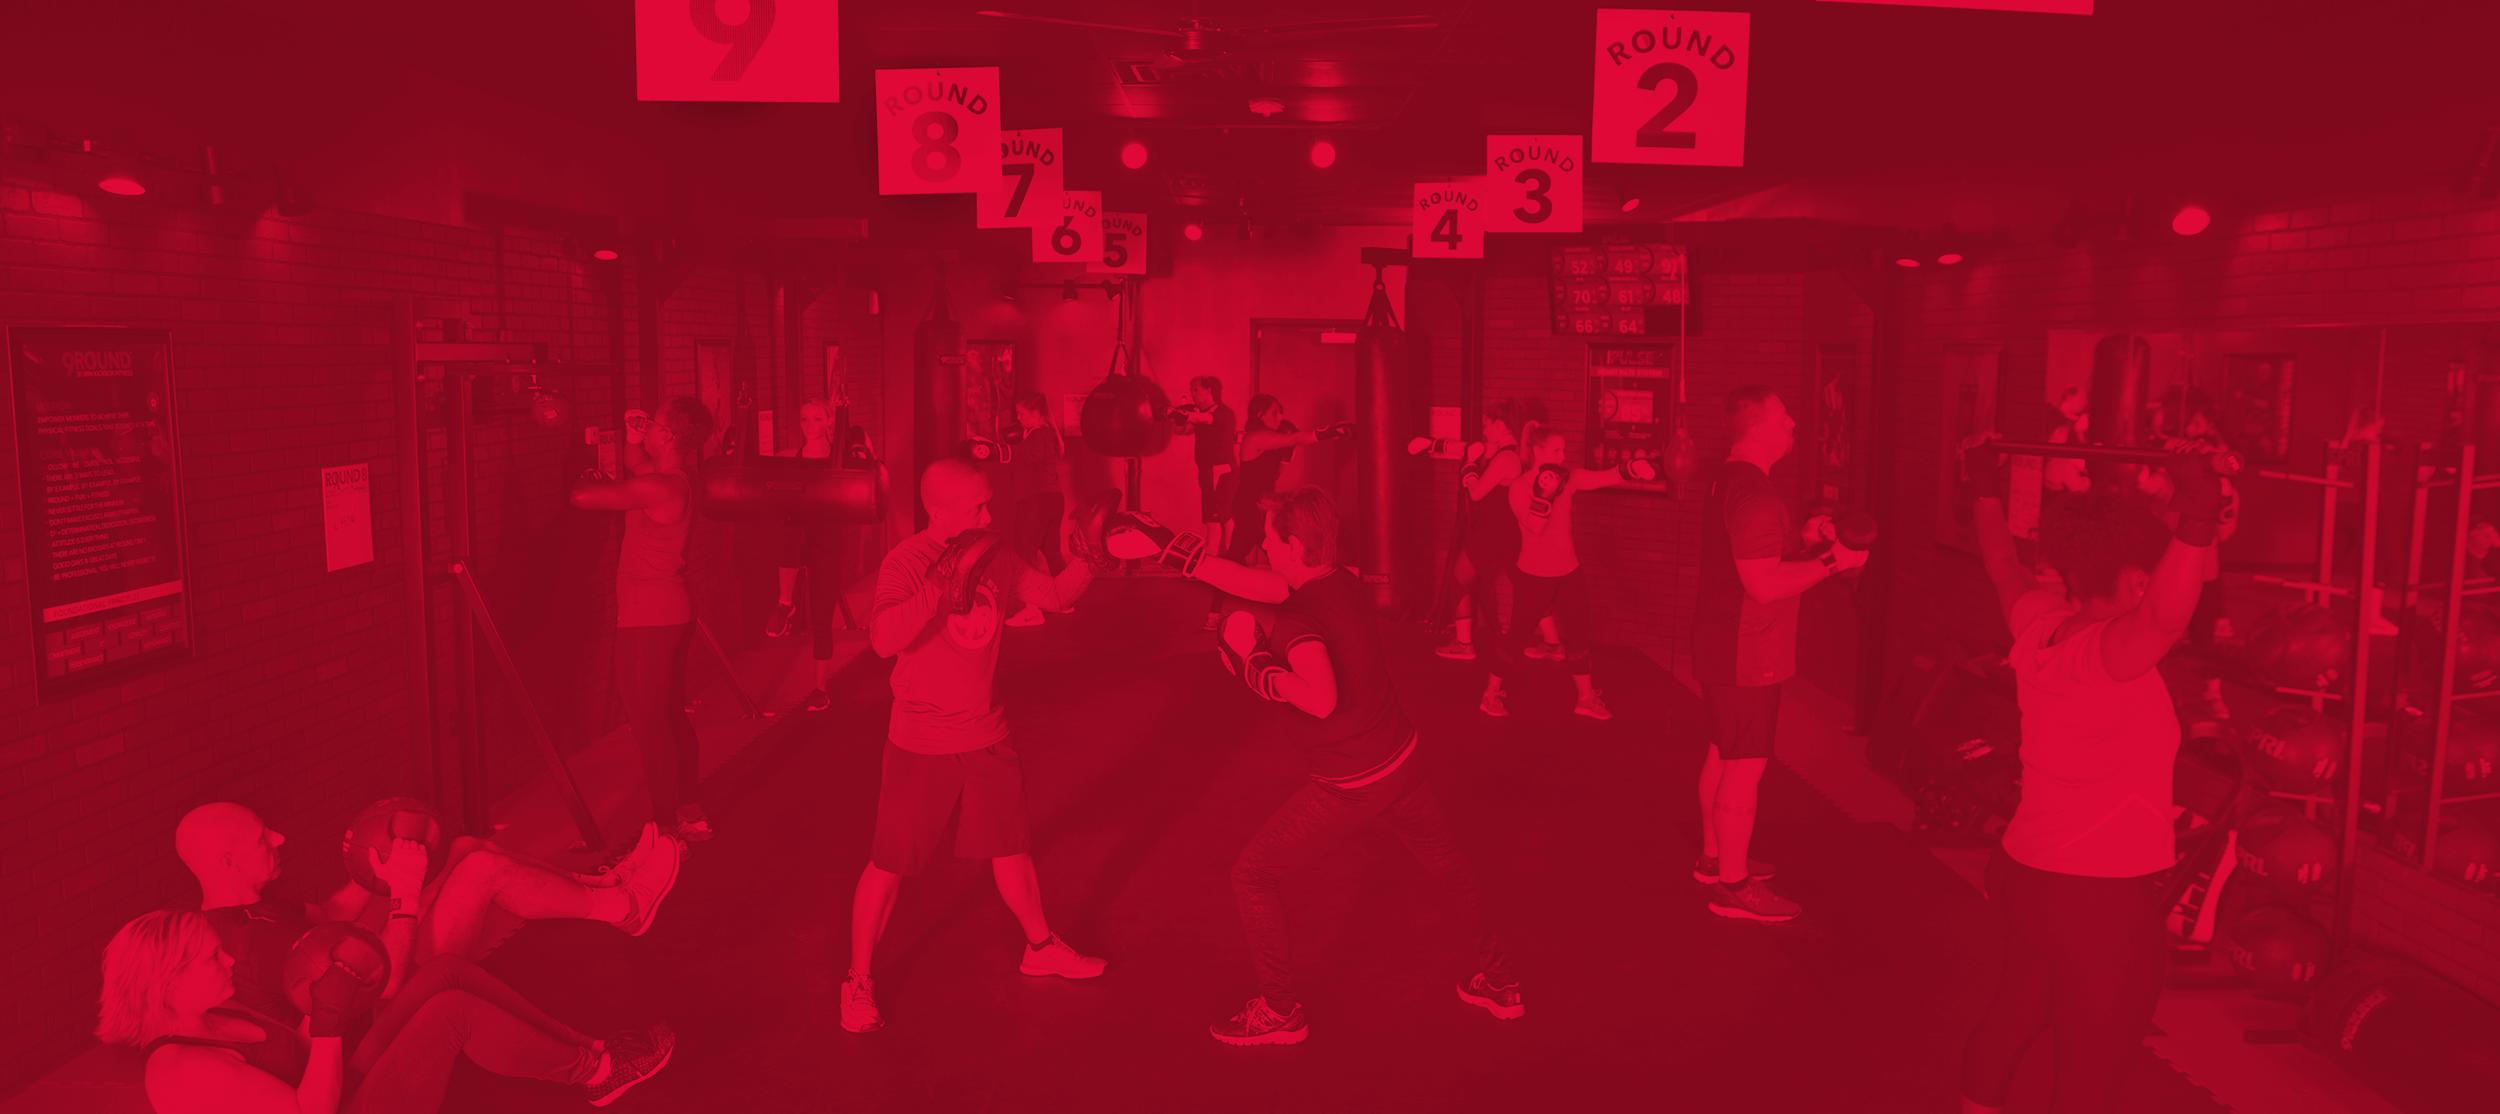 Kickboxing Fitness Gym Hooksett Nh W River Rd 9round High Intensity Workout Kickboxing Workout Fun Workouts